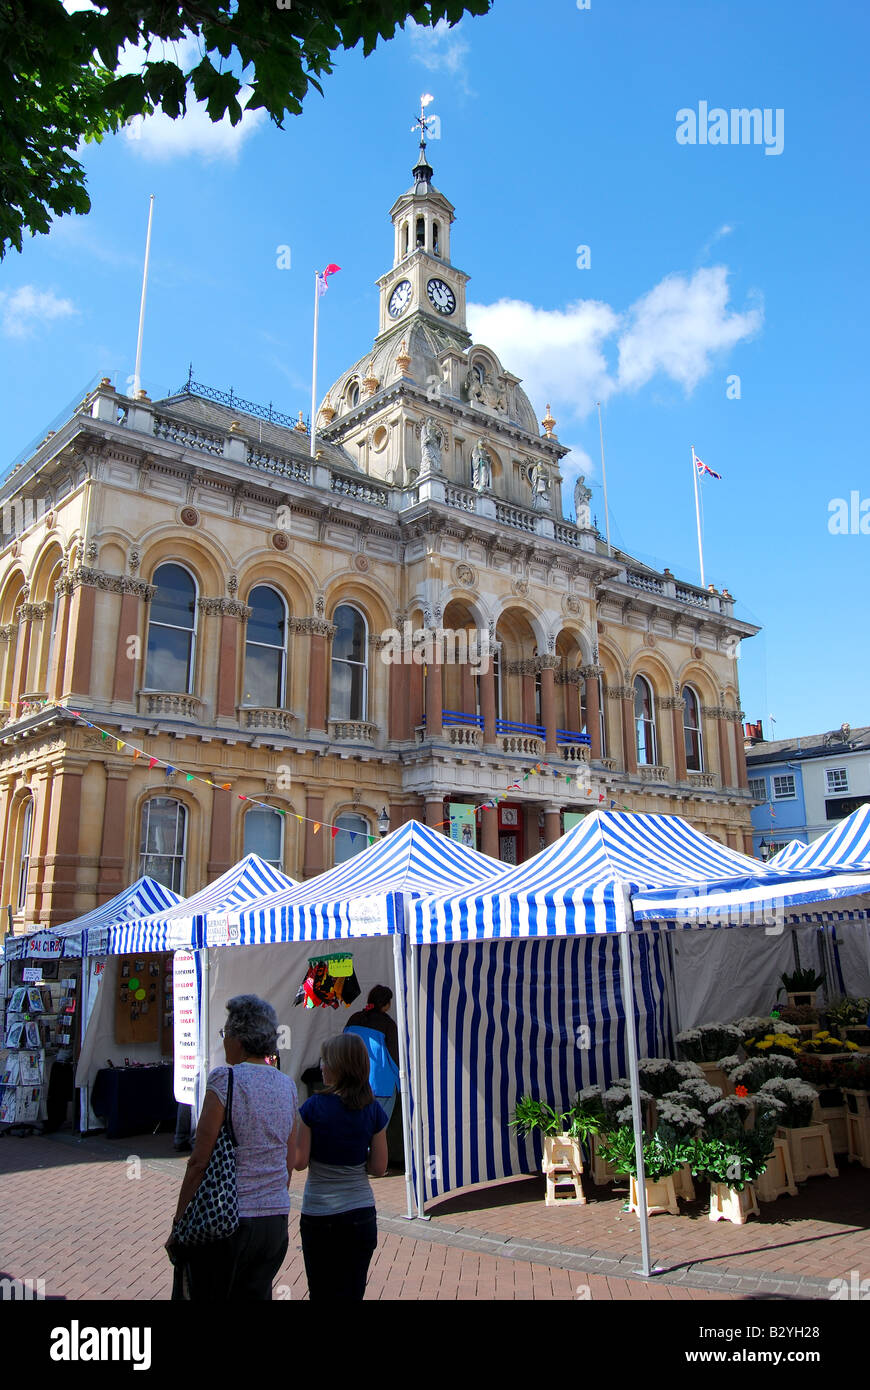 Outdoor market, The Cornhill, Ipswich, Suffolk, England, United Kingdom - Stock Image